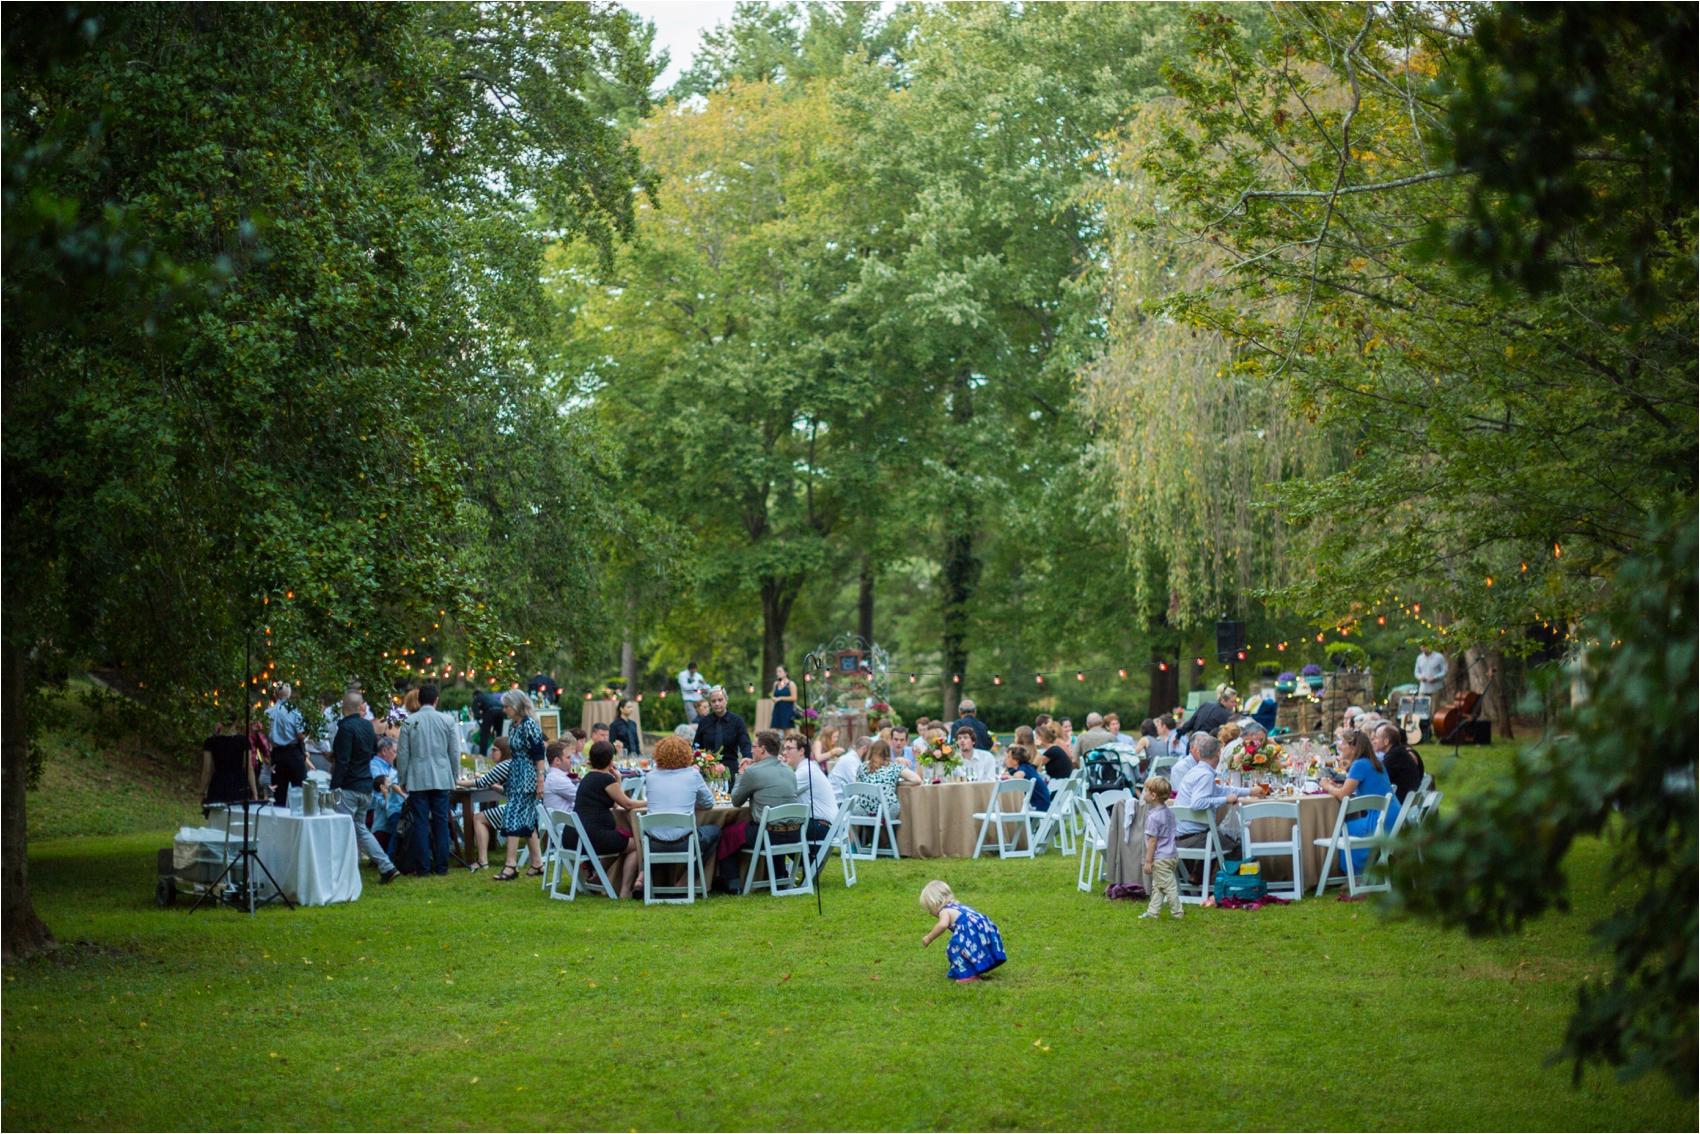 Feather-and-Oak-Rainforest-Trust-Virginia-Wedding-2-6.jpg